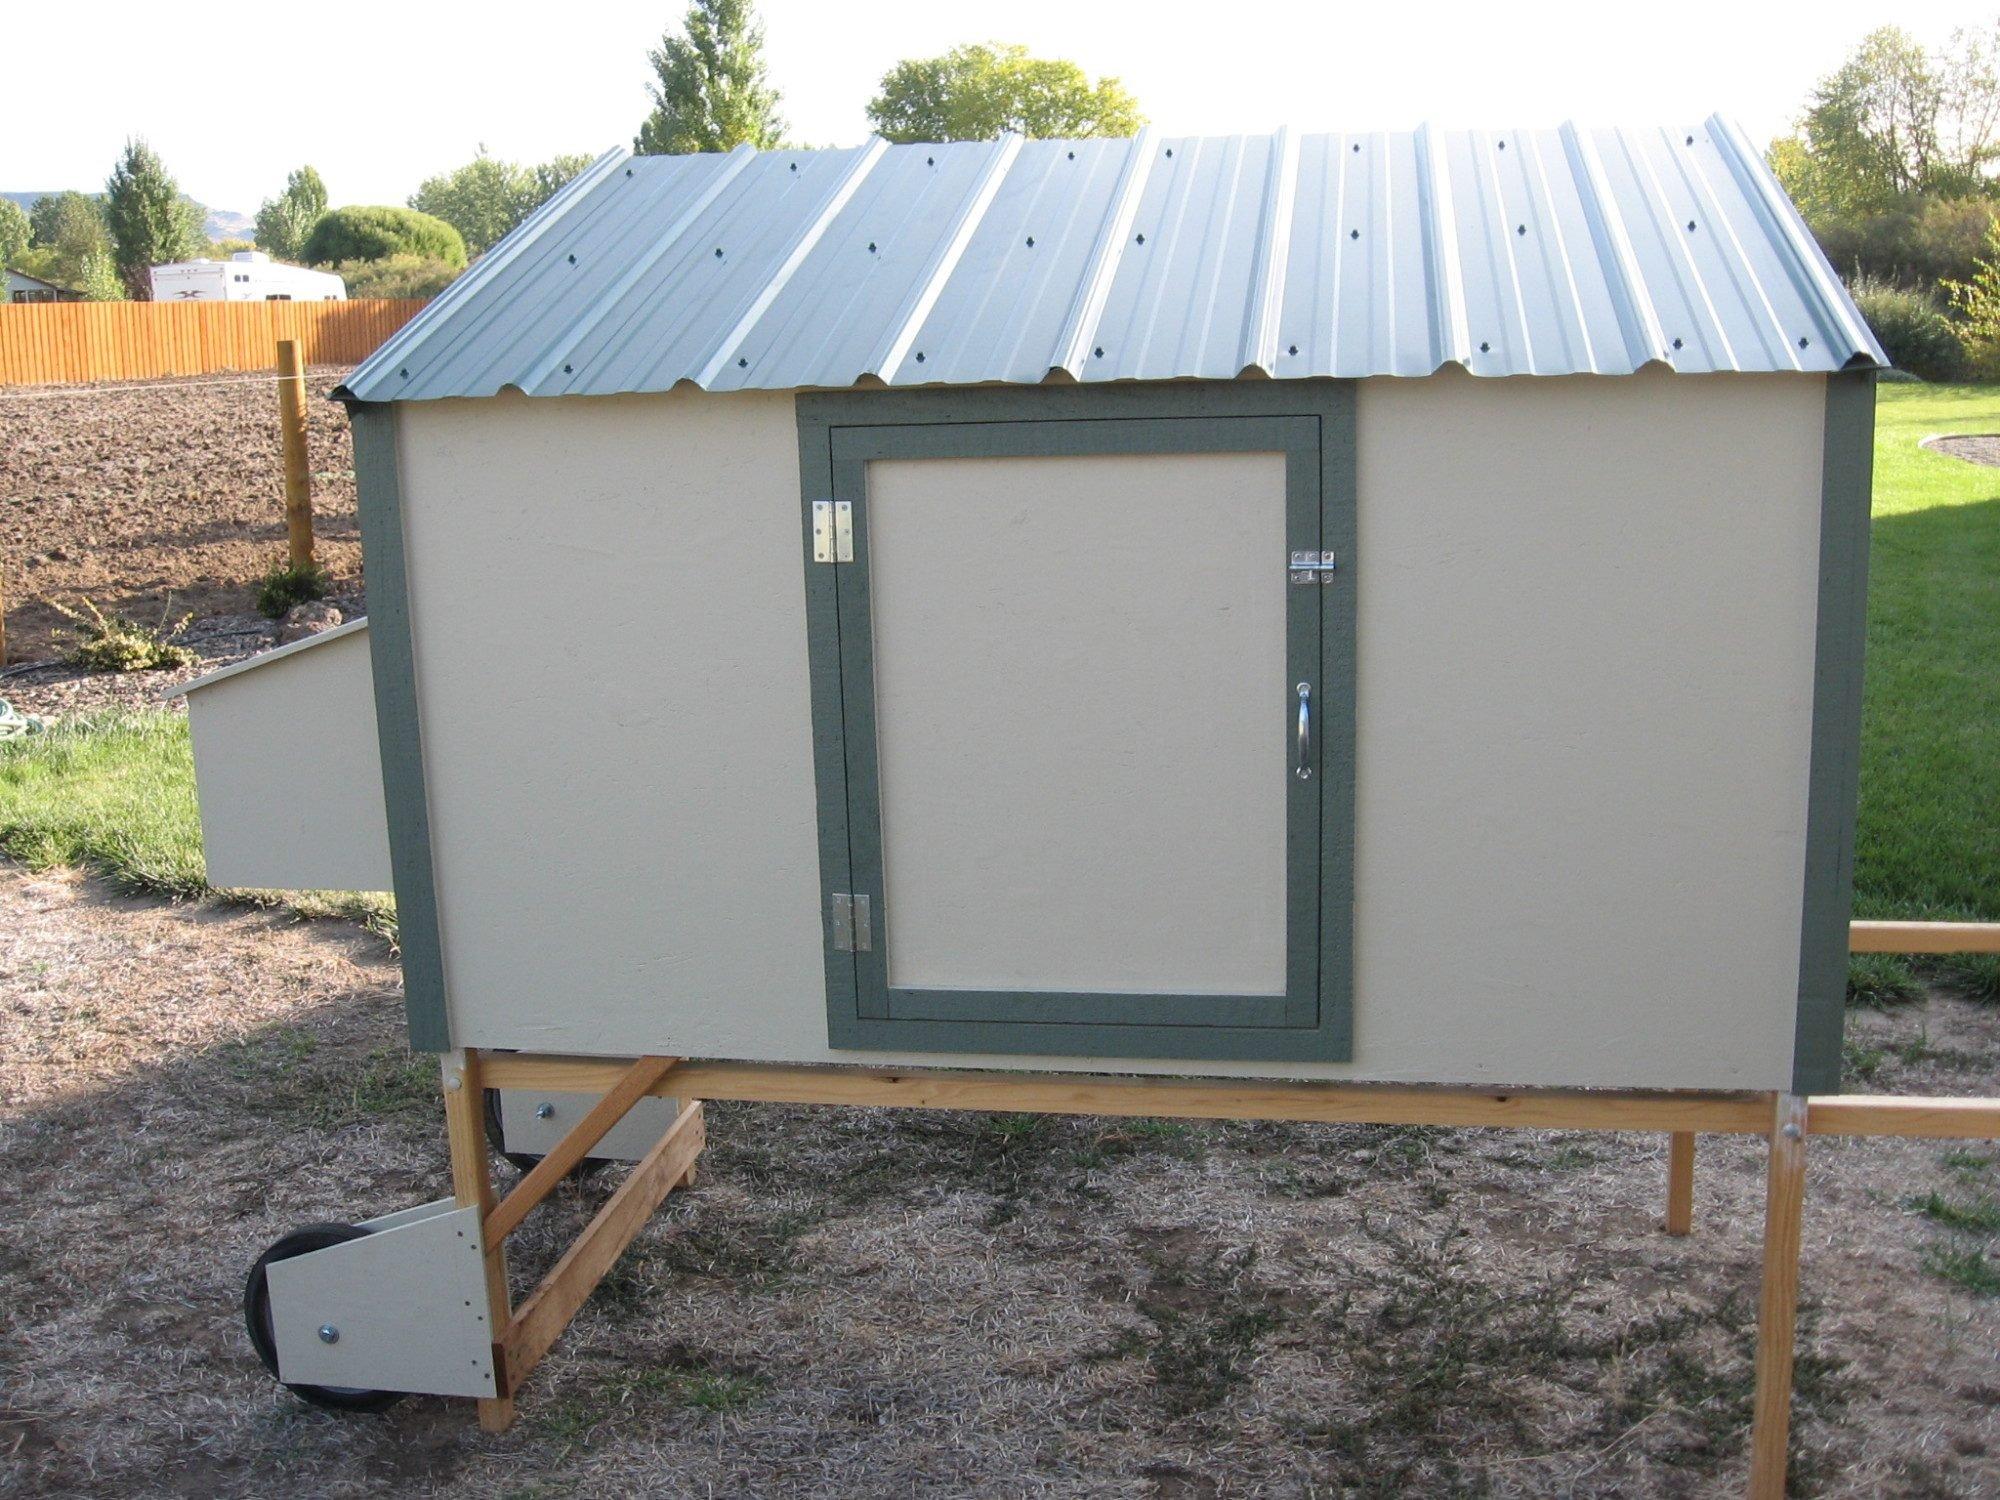 Ventilation For Chicken Houses : Mina chicken coop ventilation design